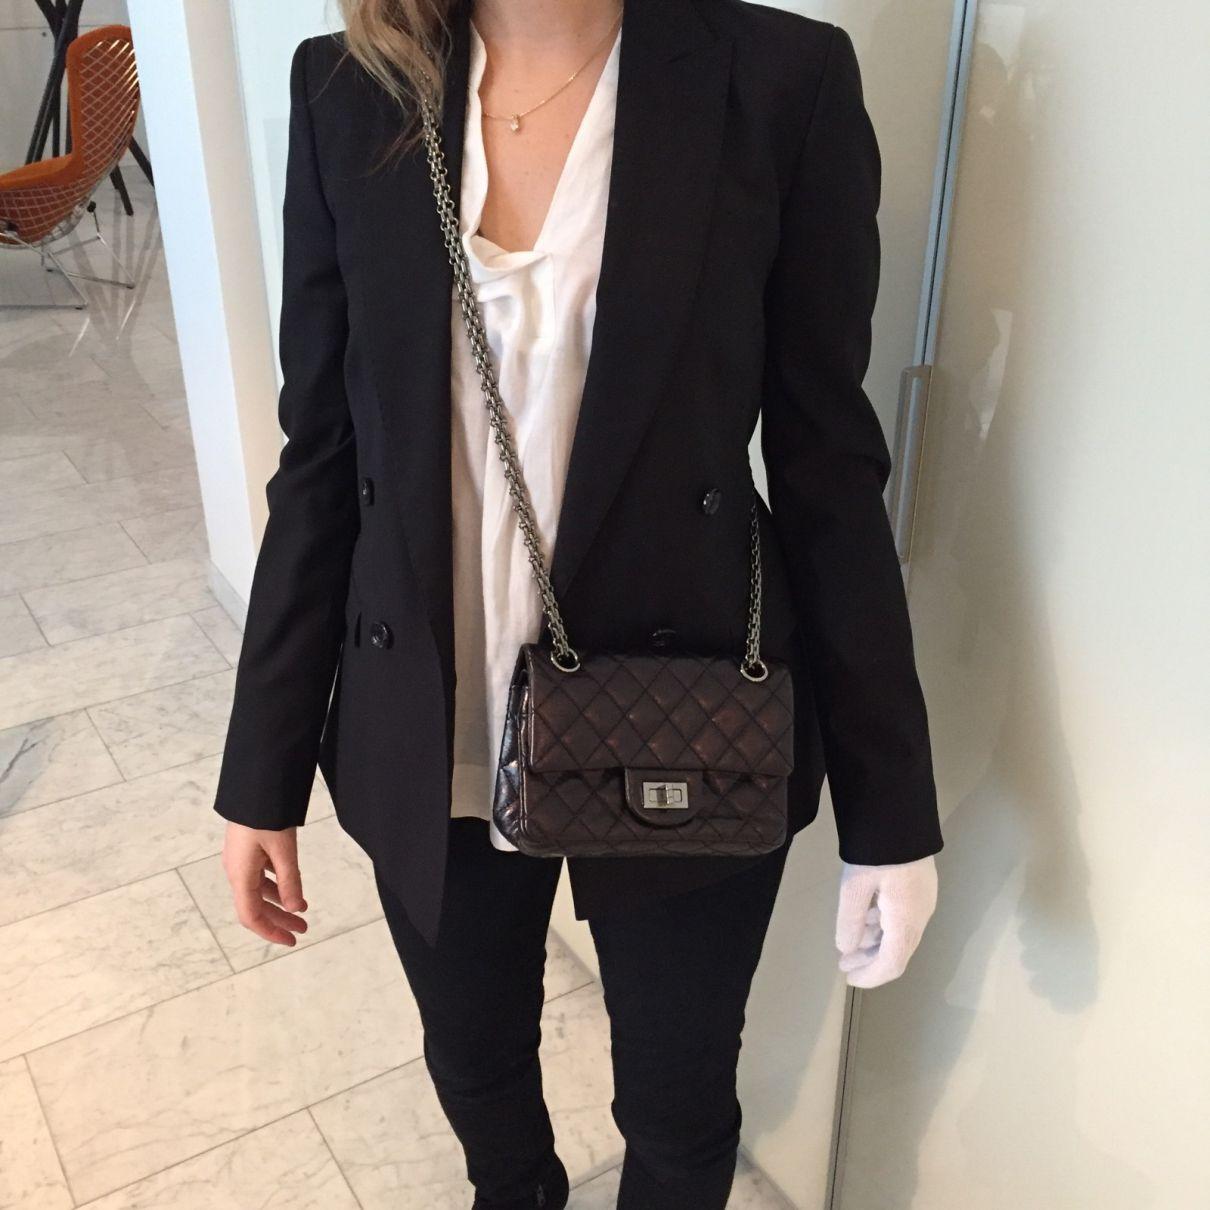 a28c40f91426 Chanel reissue 224 in 2019   purse   Chanel reissue, Chanel, Chanel ...